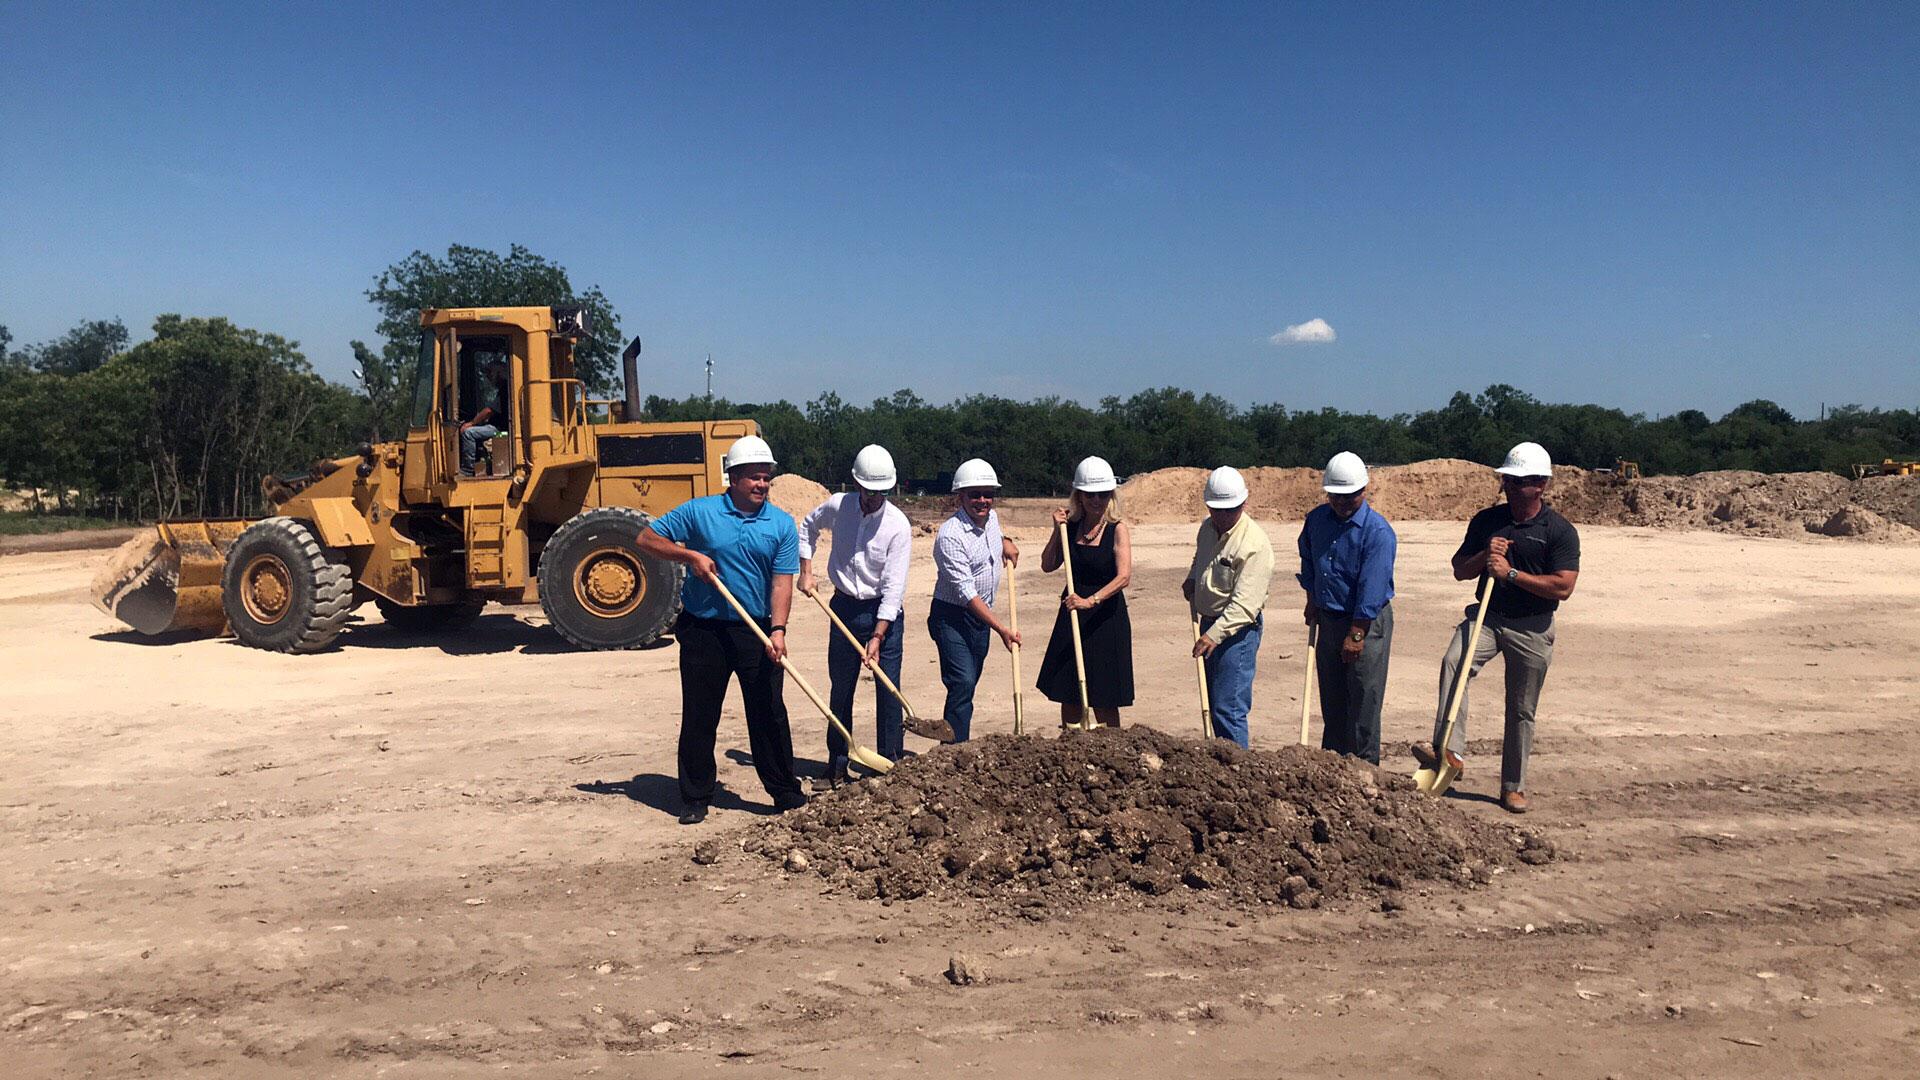 Groundbreaking for the new apartments off Rio Concho. San Angelo Mayor Brenda Gunter in the center. (LIVE! Photo/Joe Hyde)